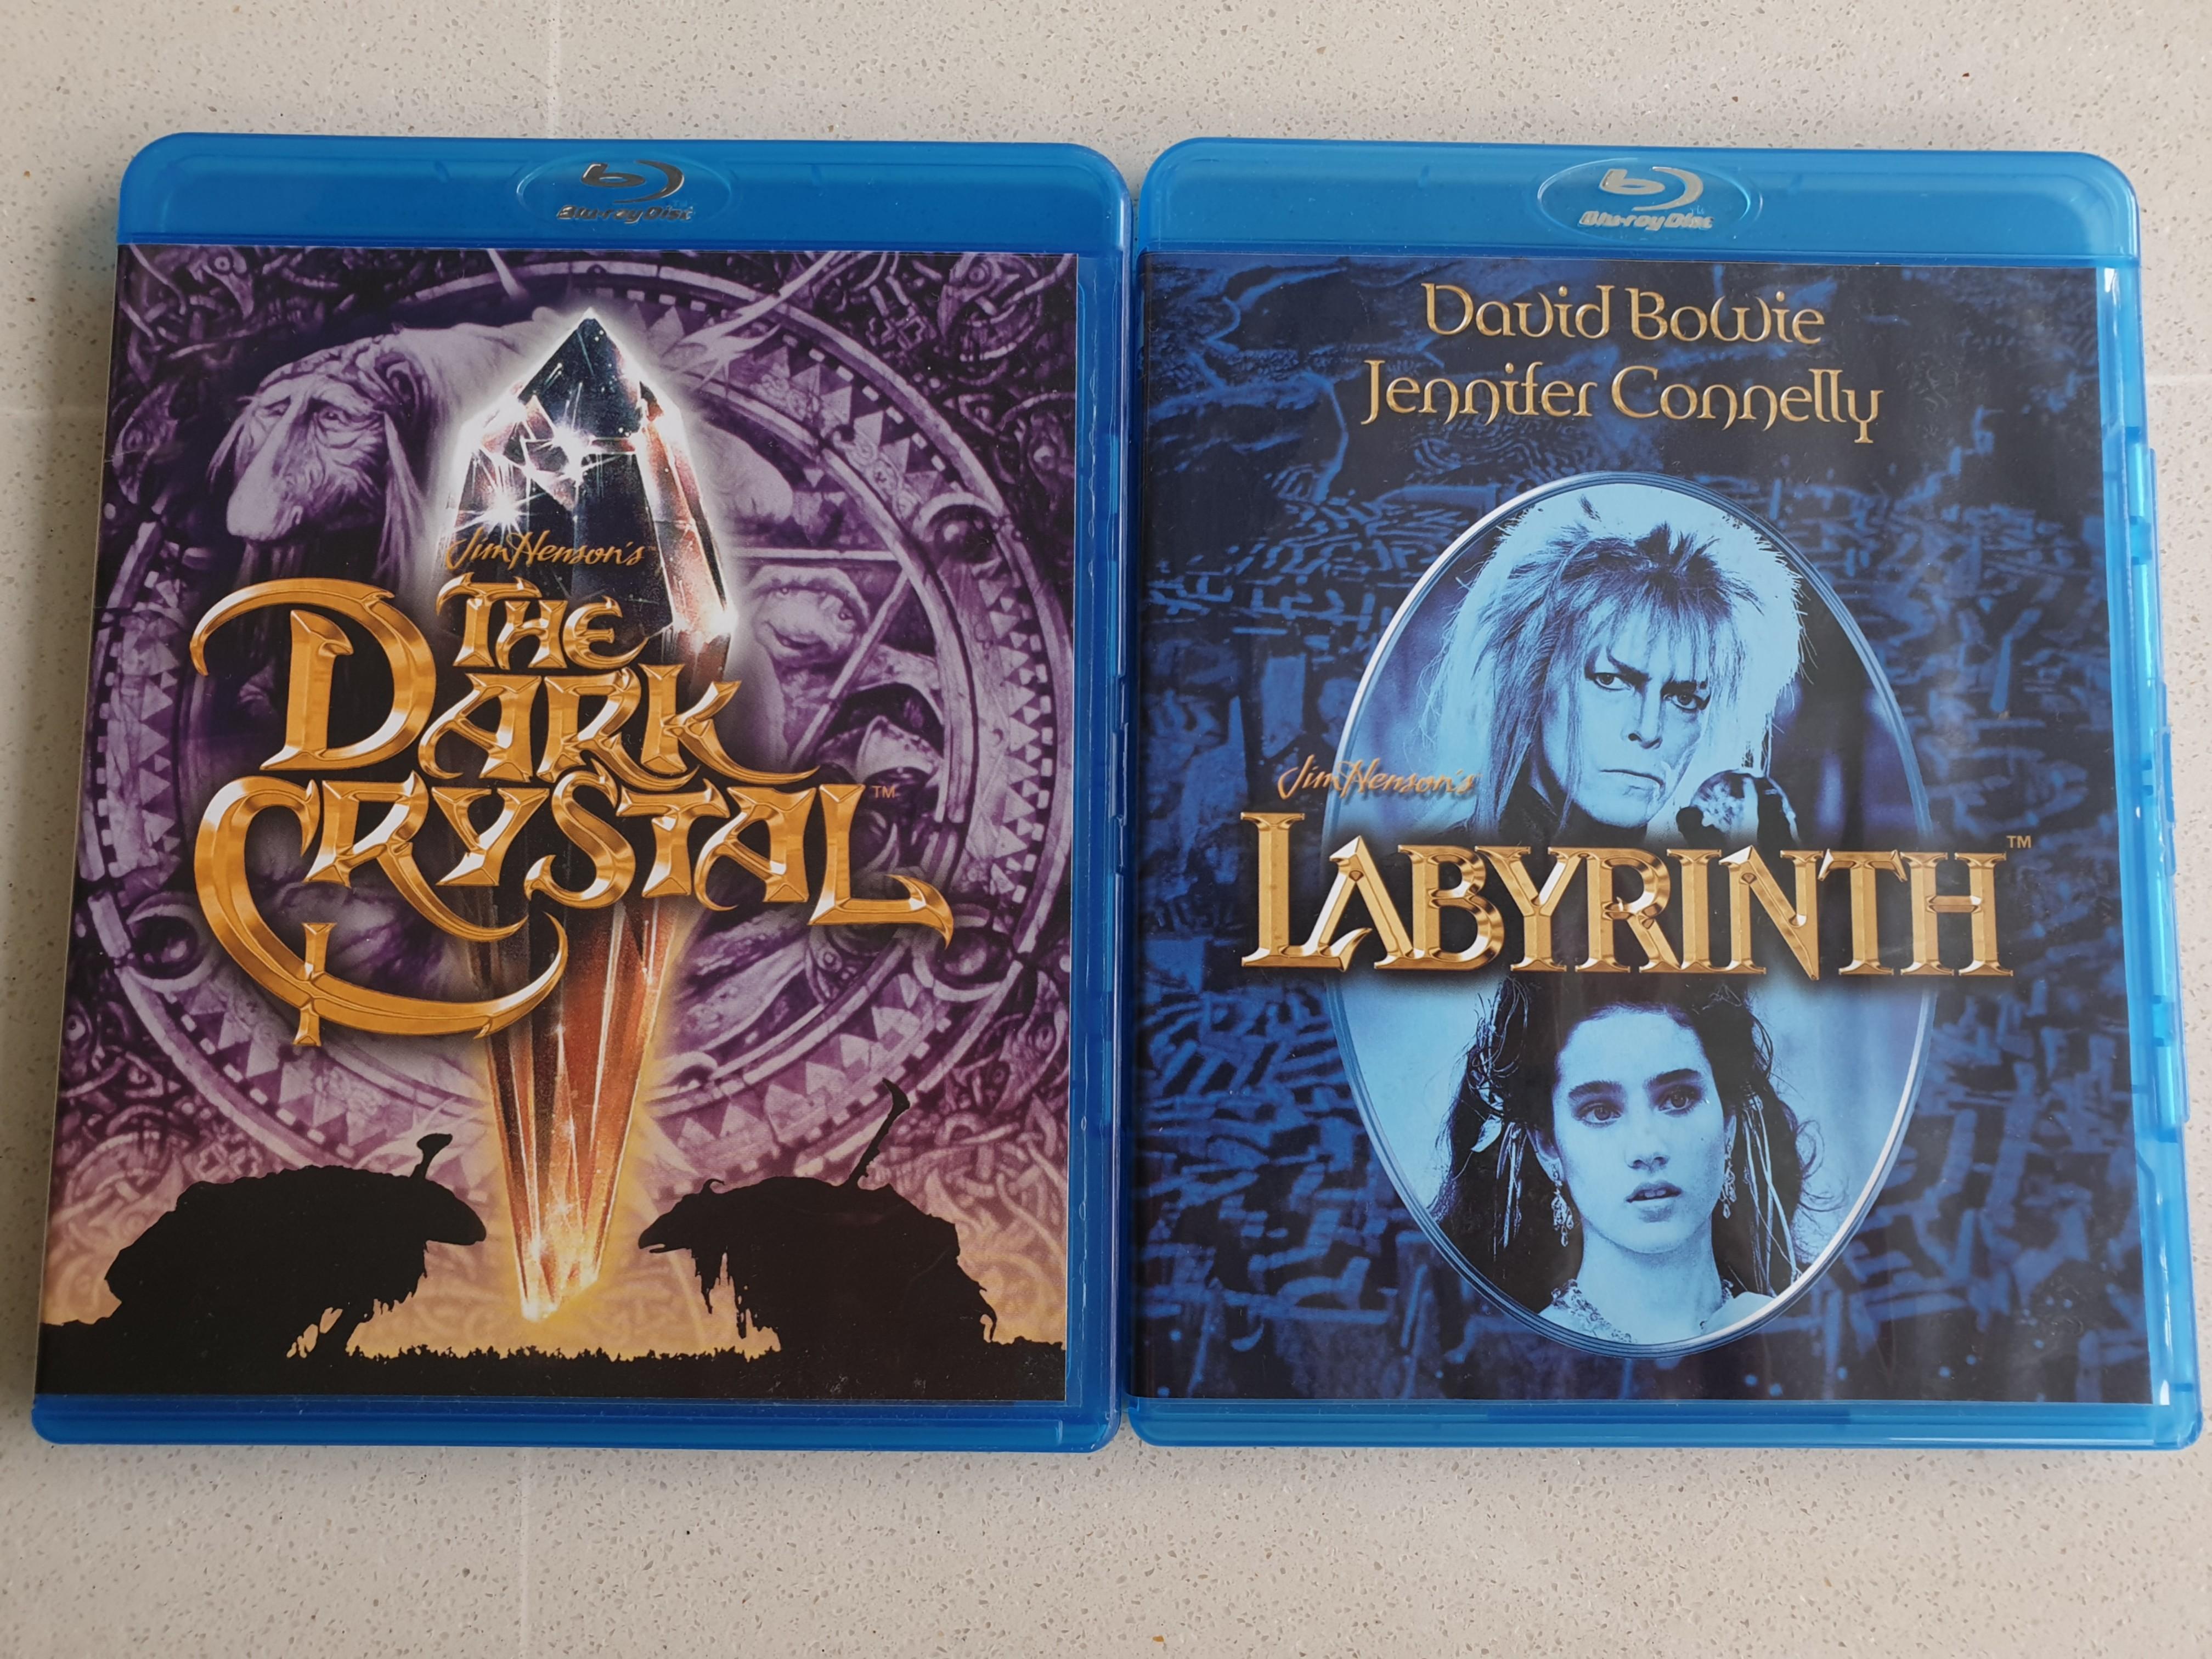 Jim Henson's Movie Collection (Labyrinth & The Dark Crystal)